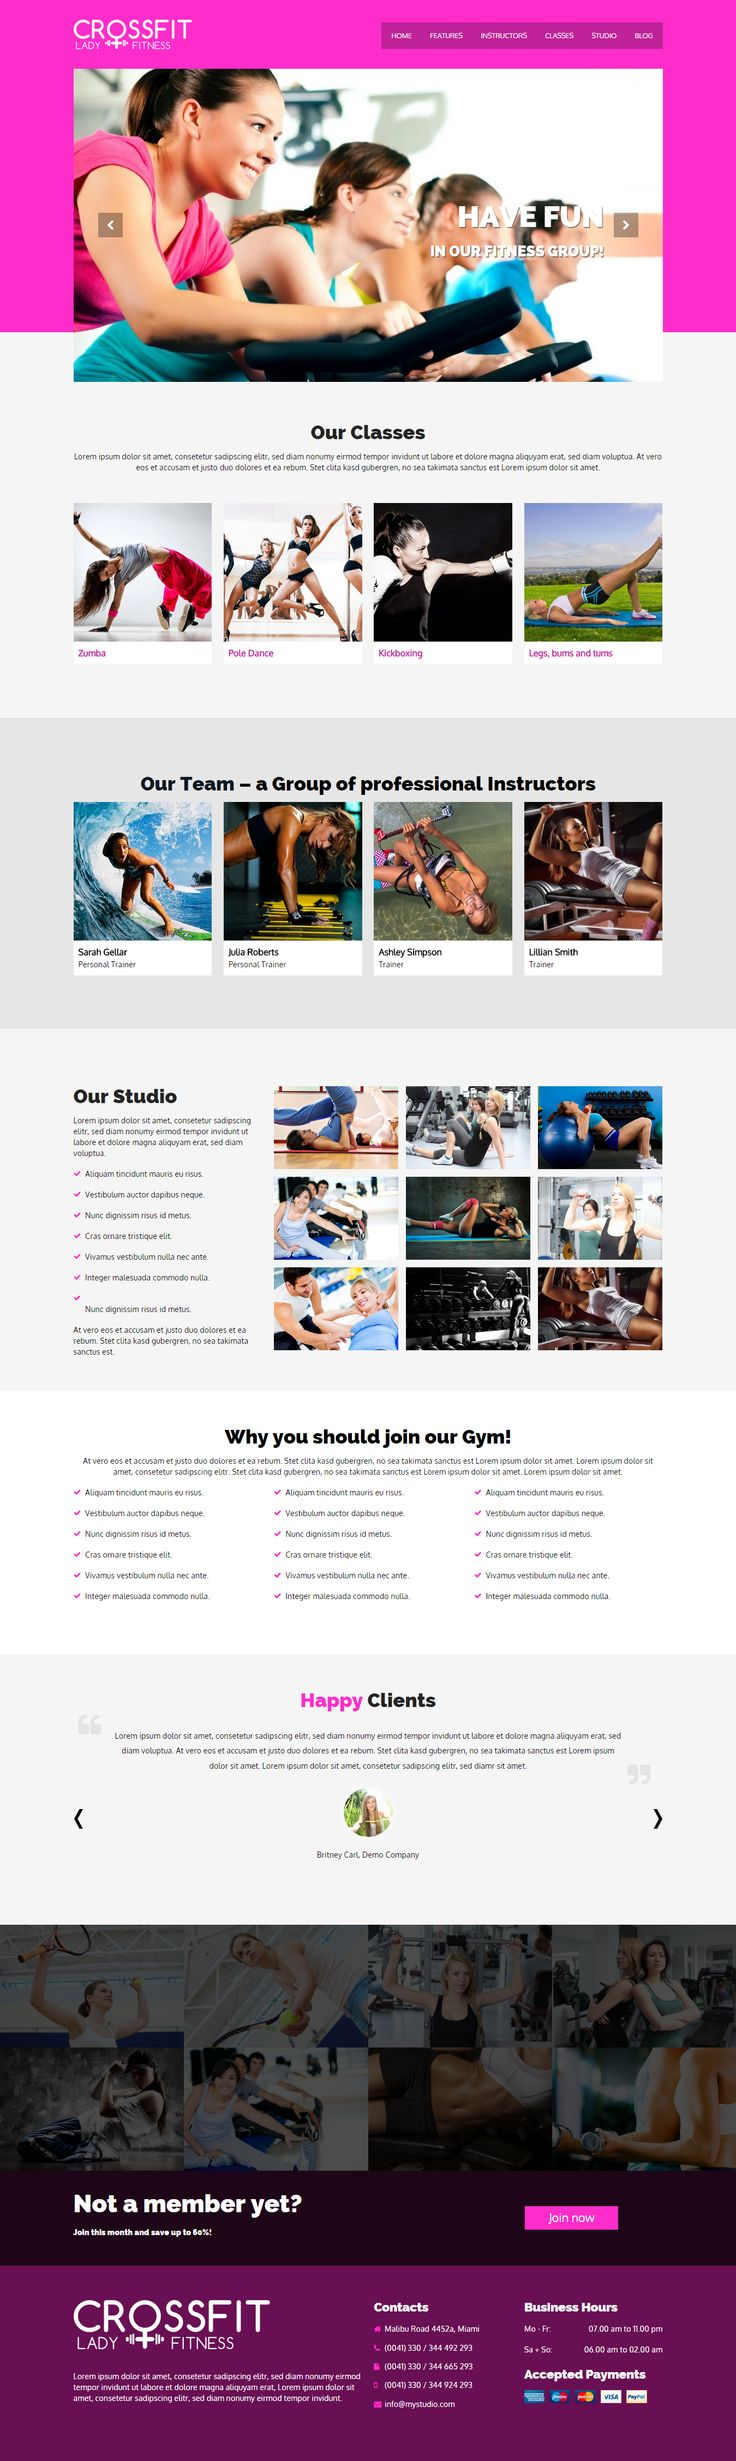 Crossfit - Responsive Sport & Gym WordPress Theme  http://7theme.net/downloads/crossfit-wordpress-gym-theme/